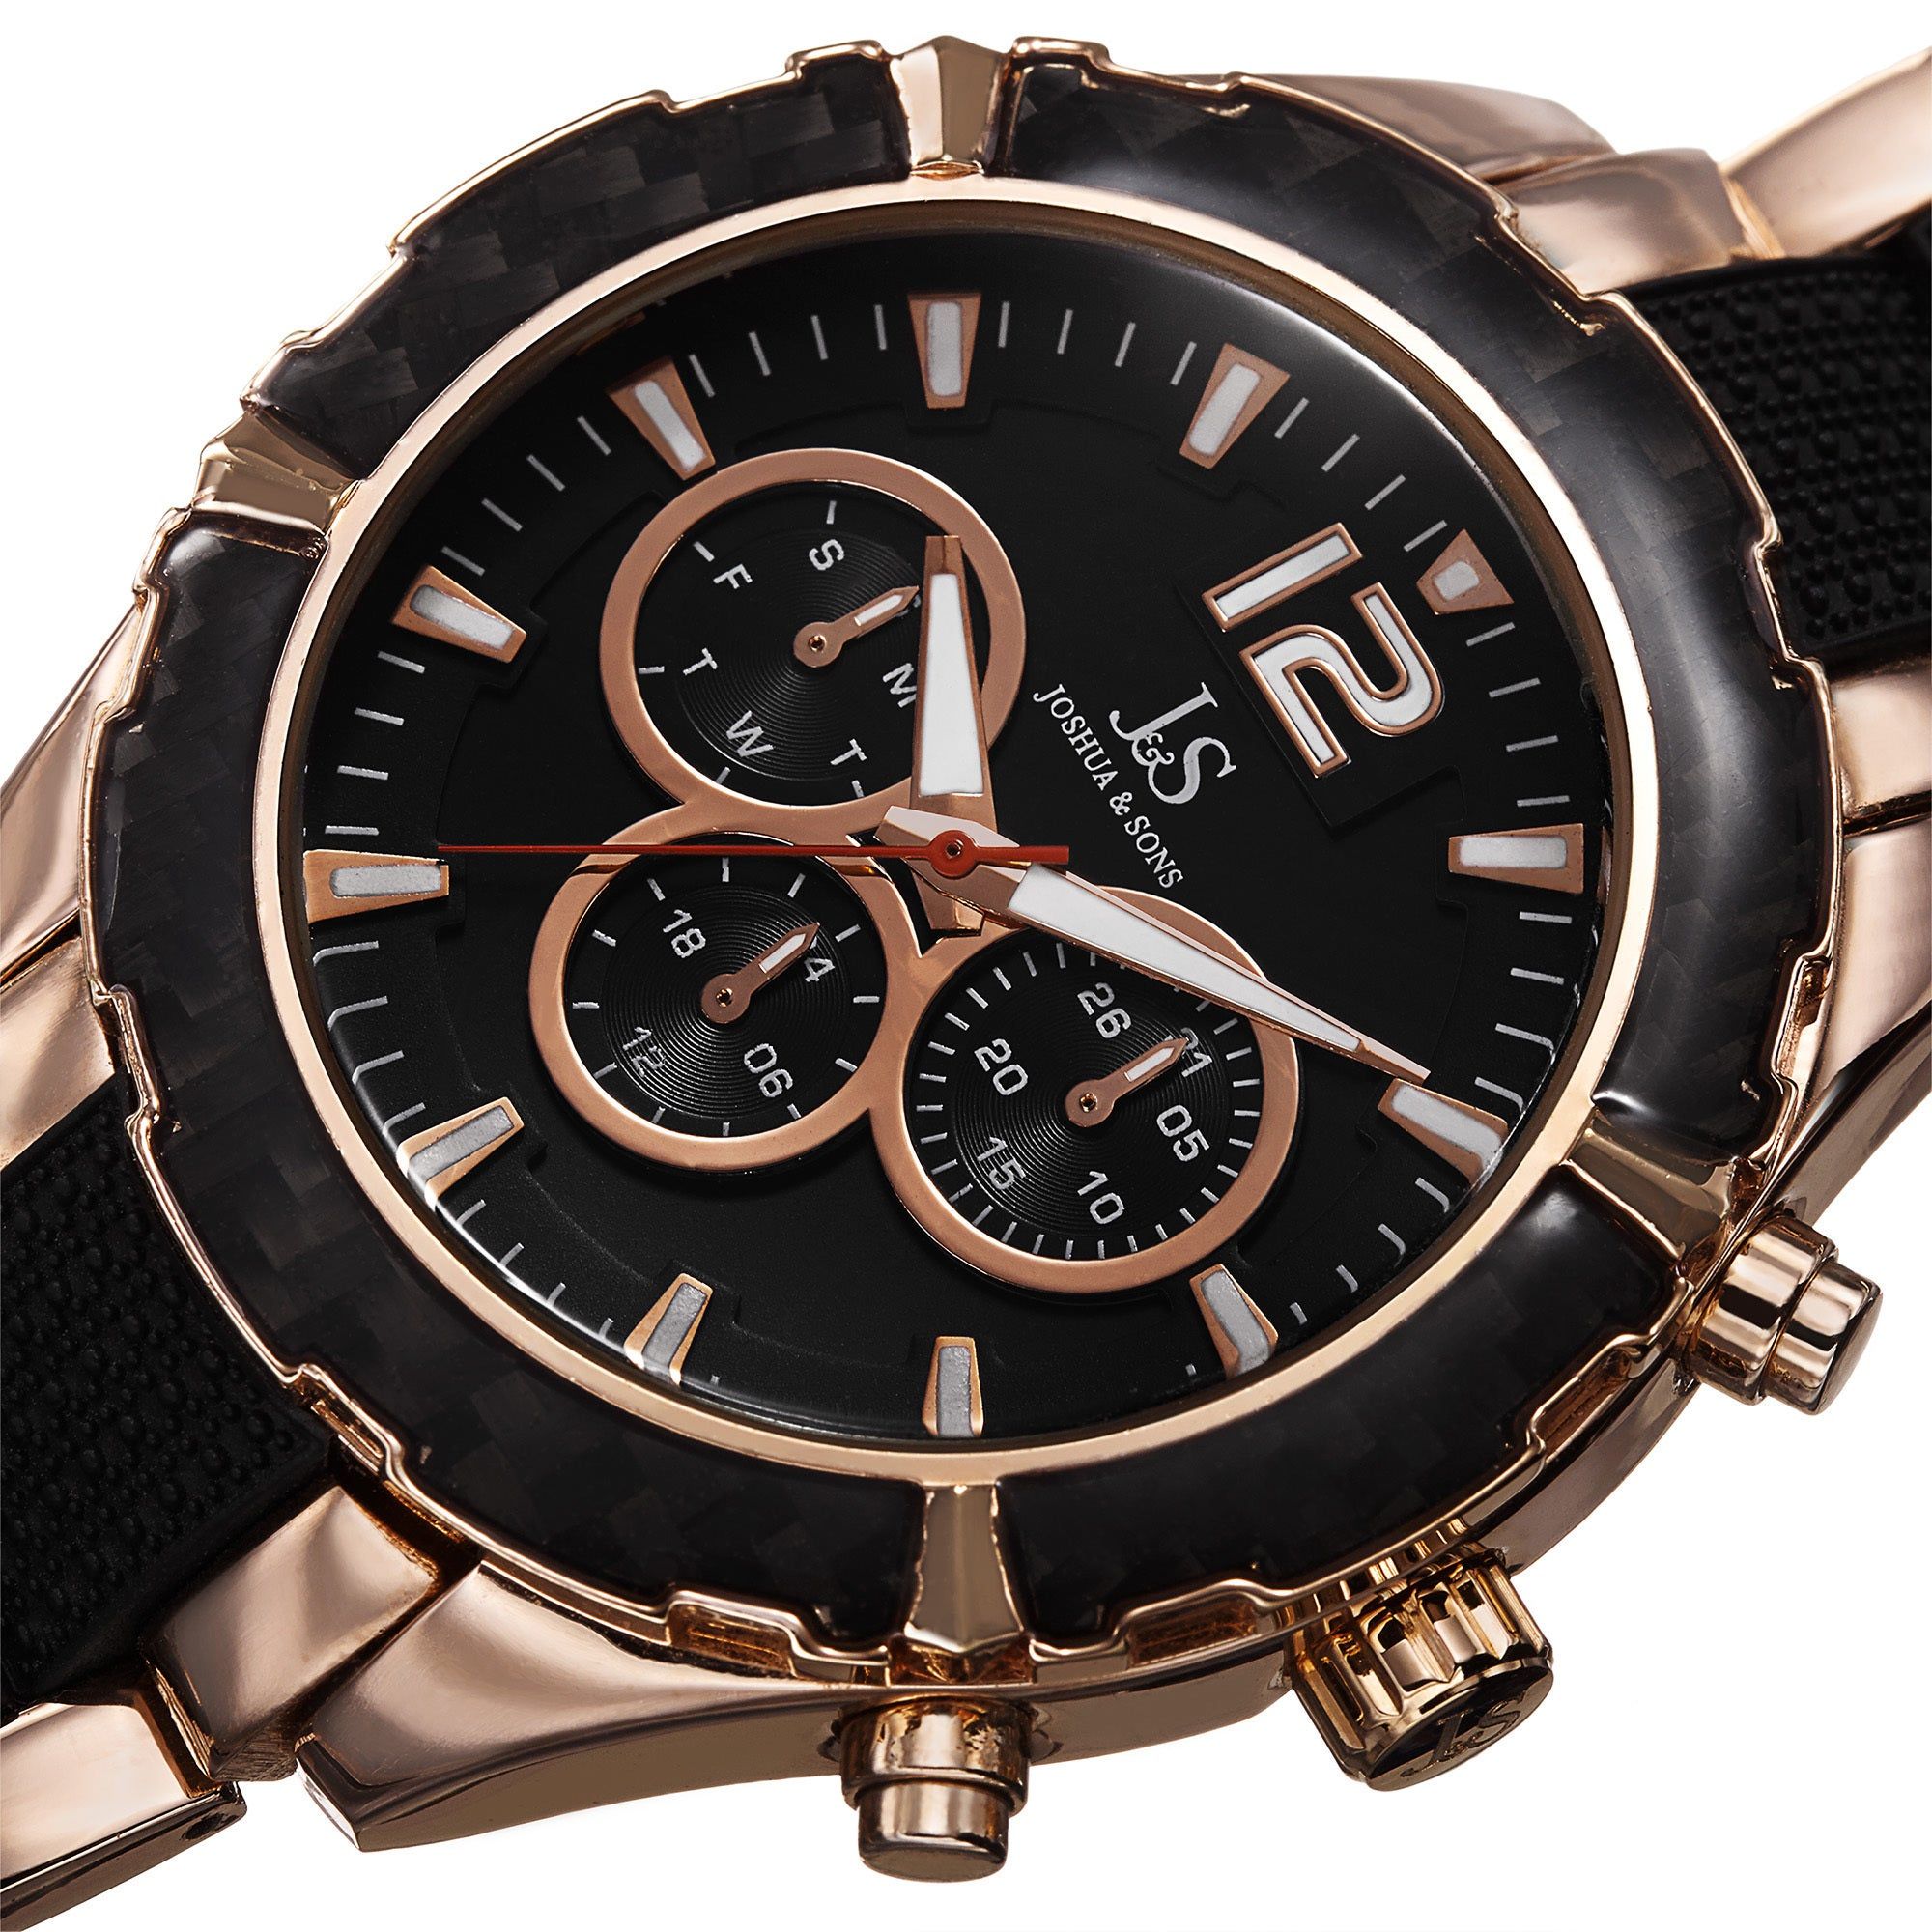 5cd99970577 Joshua   Sons Men s Swiss Quartz Multifunction Dual-Time Rose-Tone Bracelet  Watch - GOLD - Free Shipping Today - Overstock - 17615959